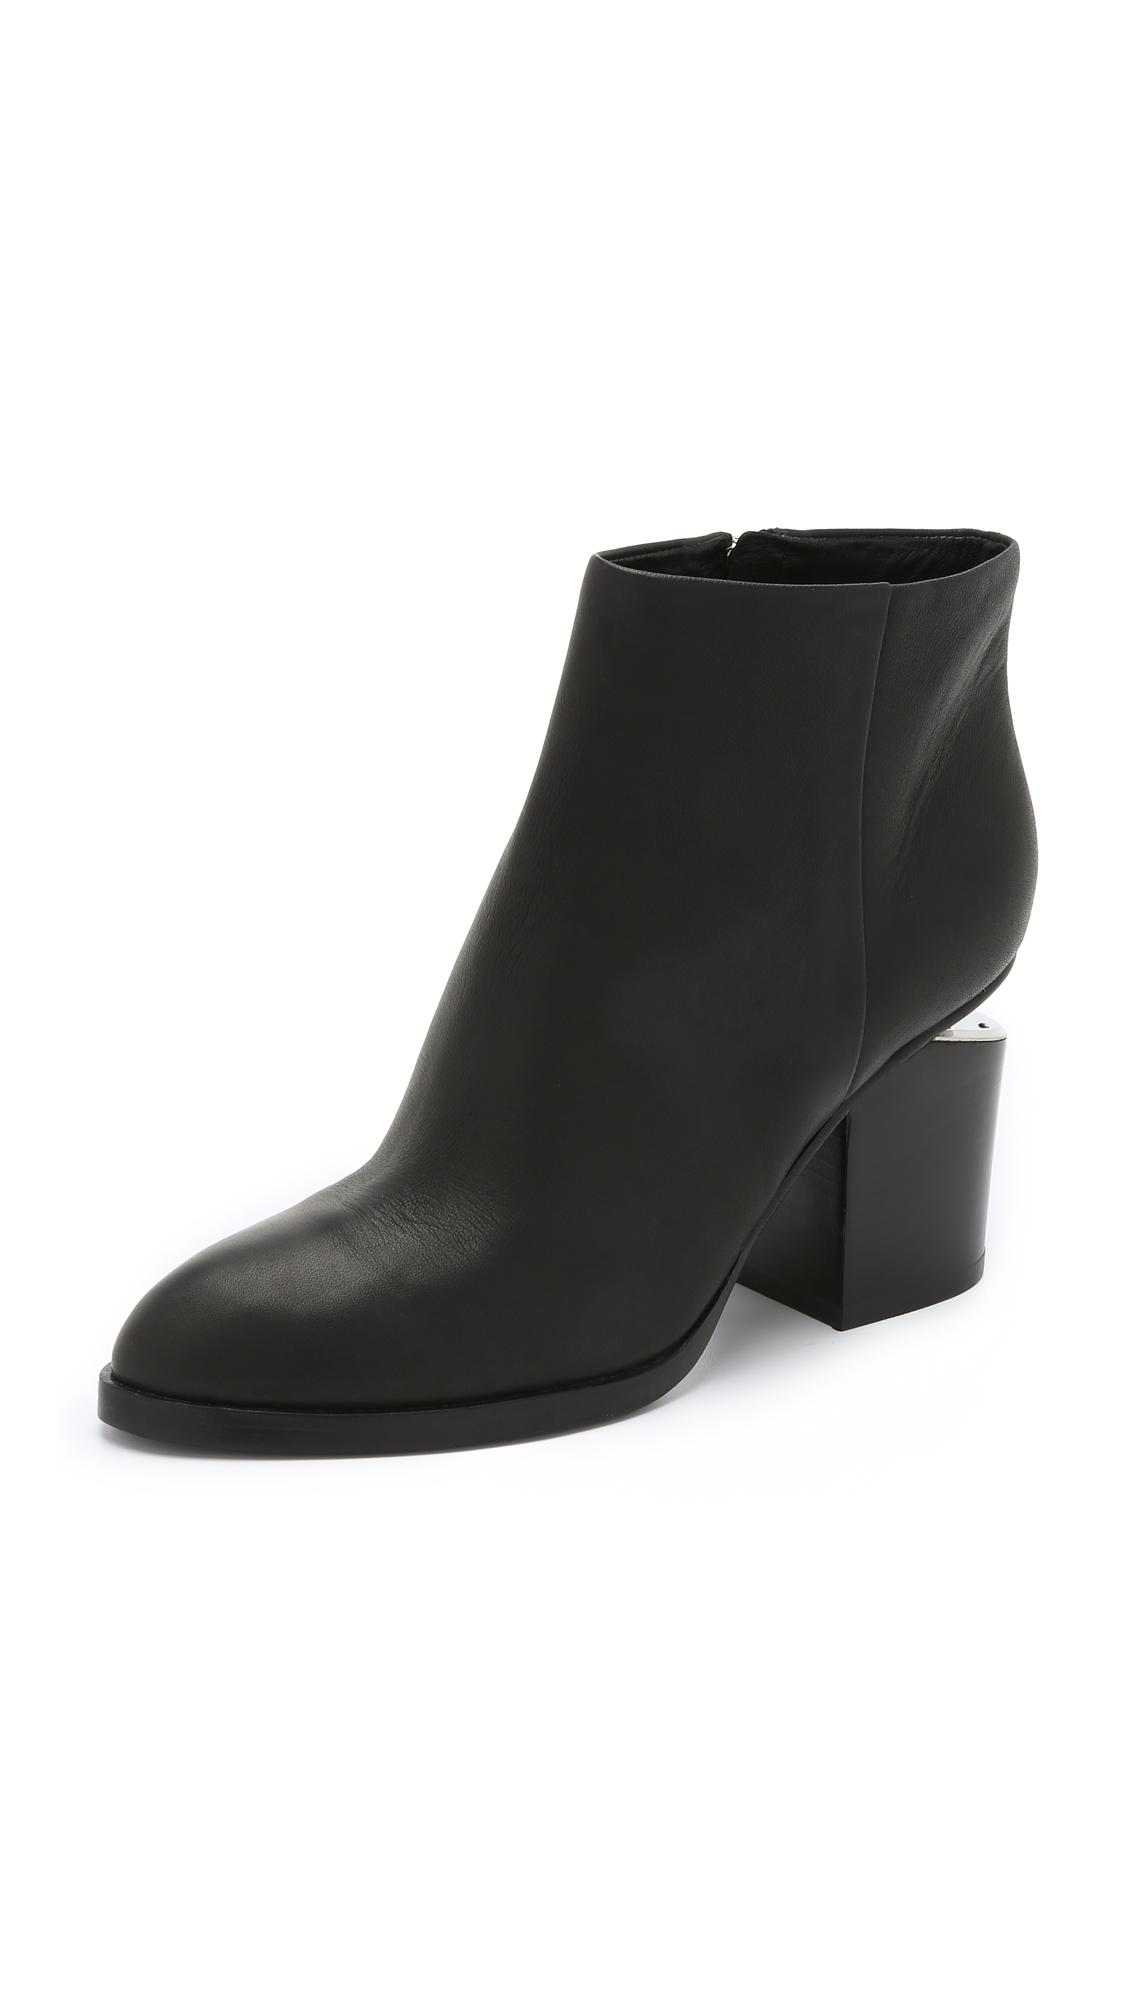 Women'S Gabi Round Toe Leather Booties - Silver-Tone Hardware in Black